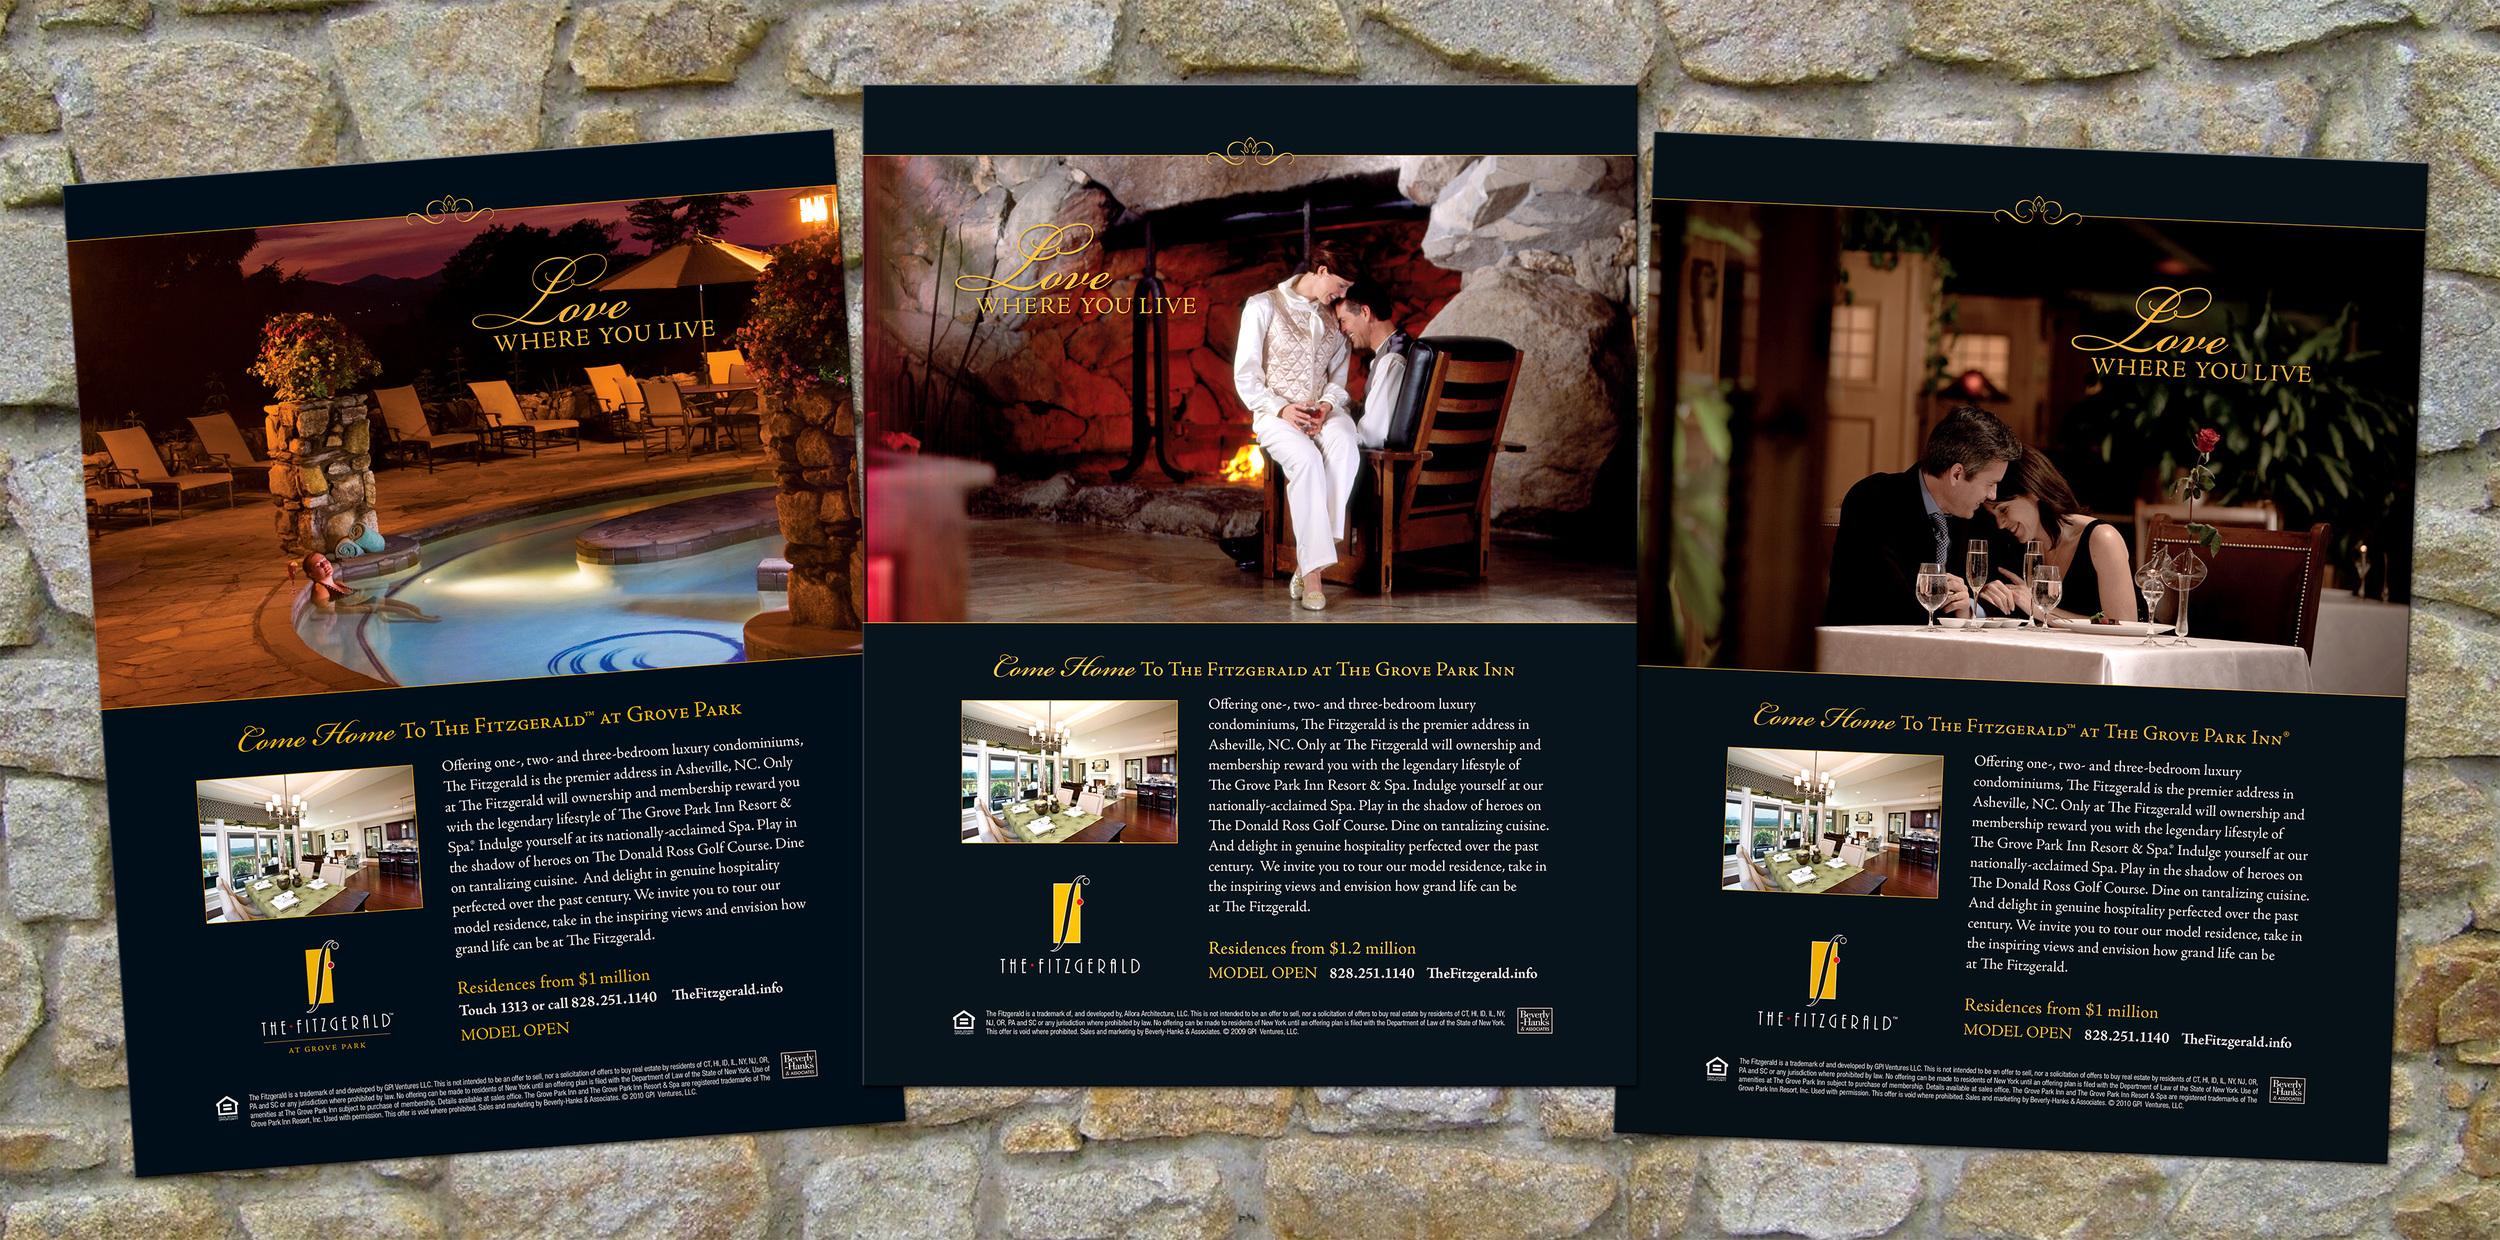 "The Fitzgerald ""Love Where you Live"" Ad Campaign"